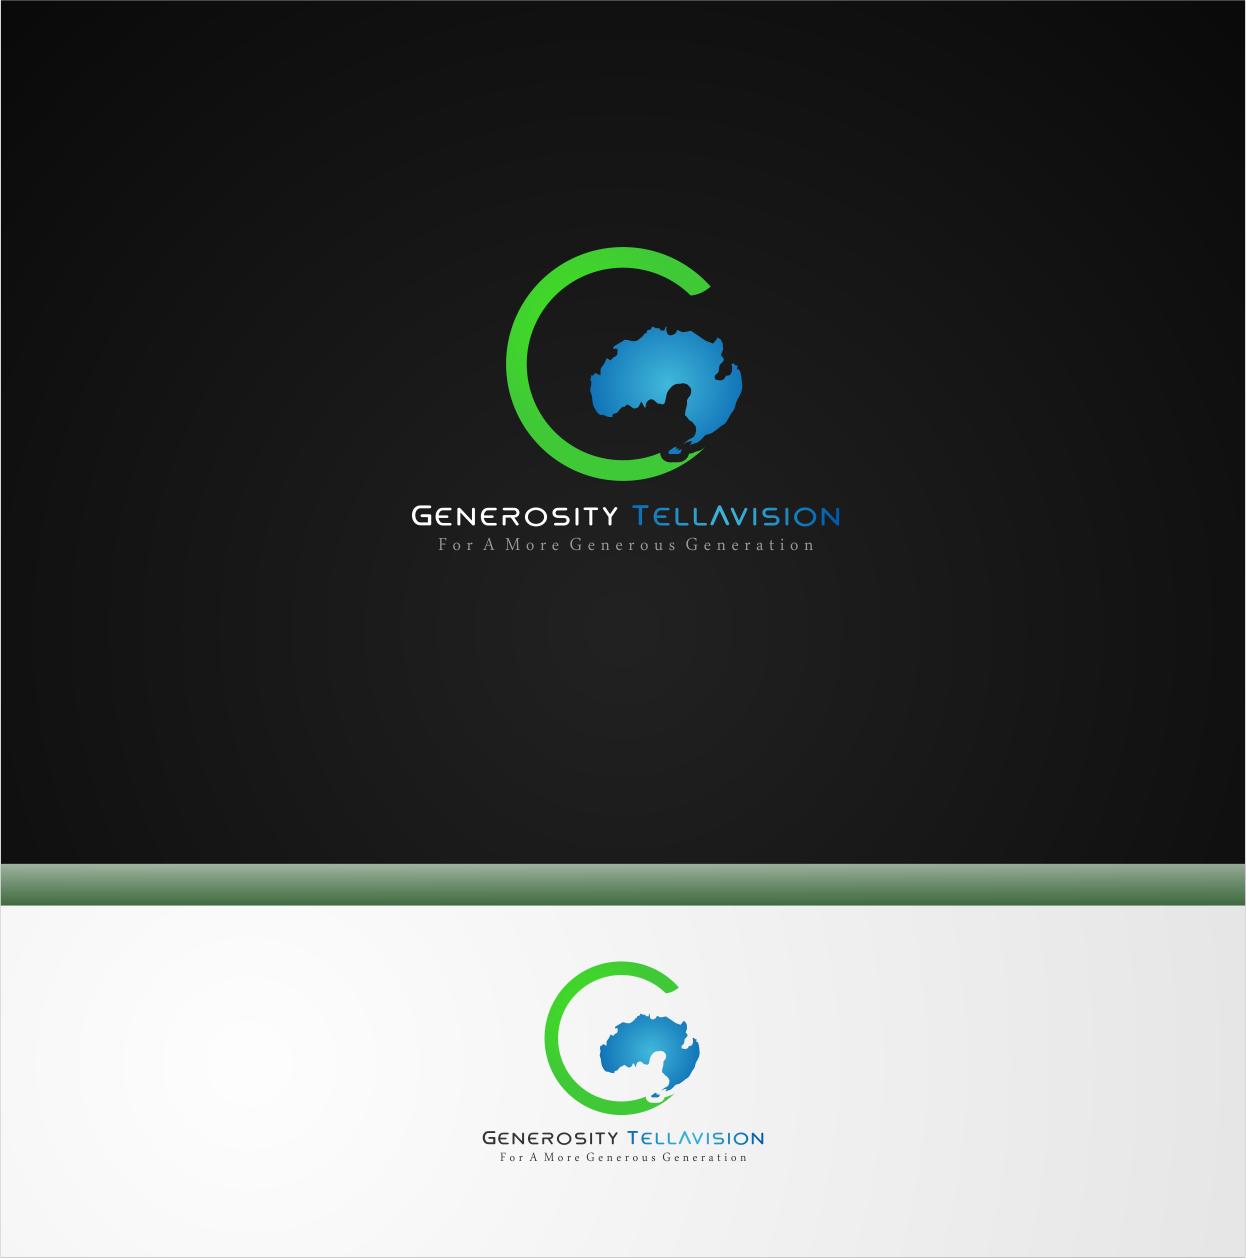 Logo Design by Private User - Entry No. 17 in the Logo Design Contest Artistic Logo Design for Generosity TellAVision.